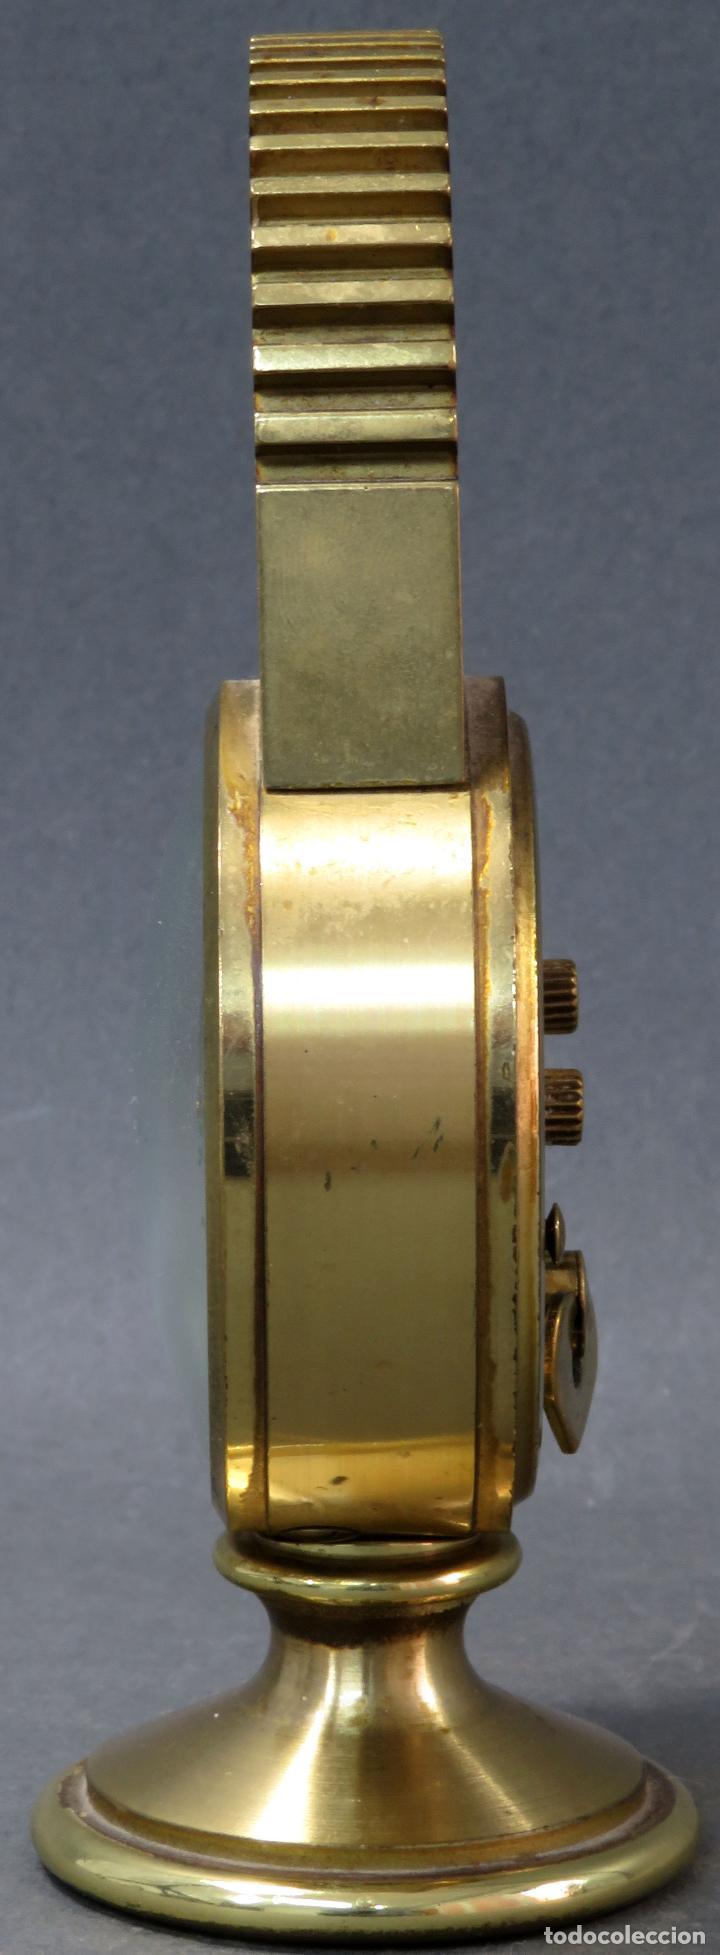 Despertadores antiguos: Reloj despertador bronce forma cabeza caballo Swiza ocho días funcionando años 80 - Foto 3 - 124628555